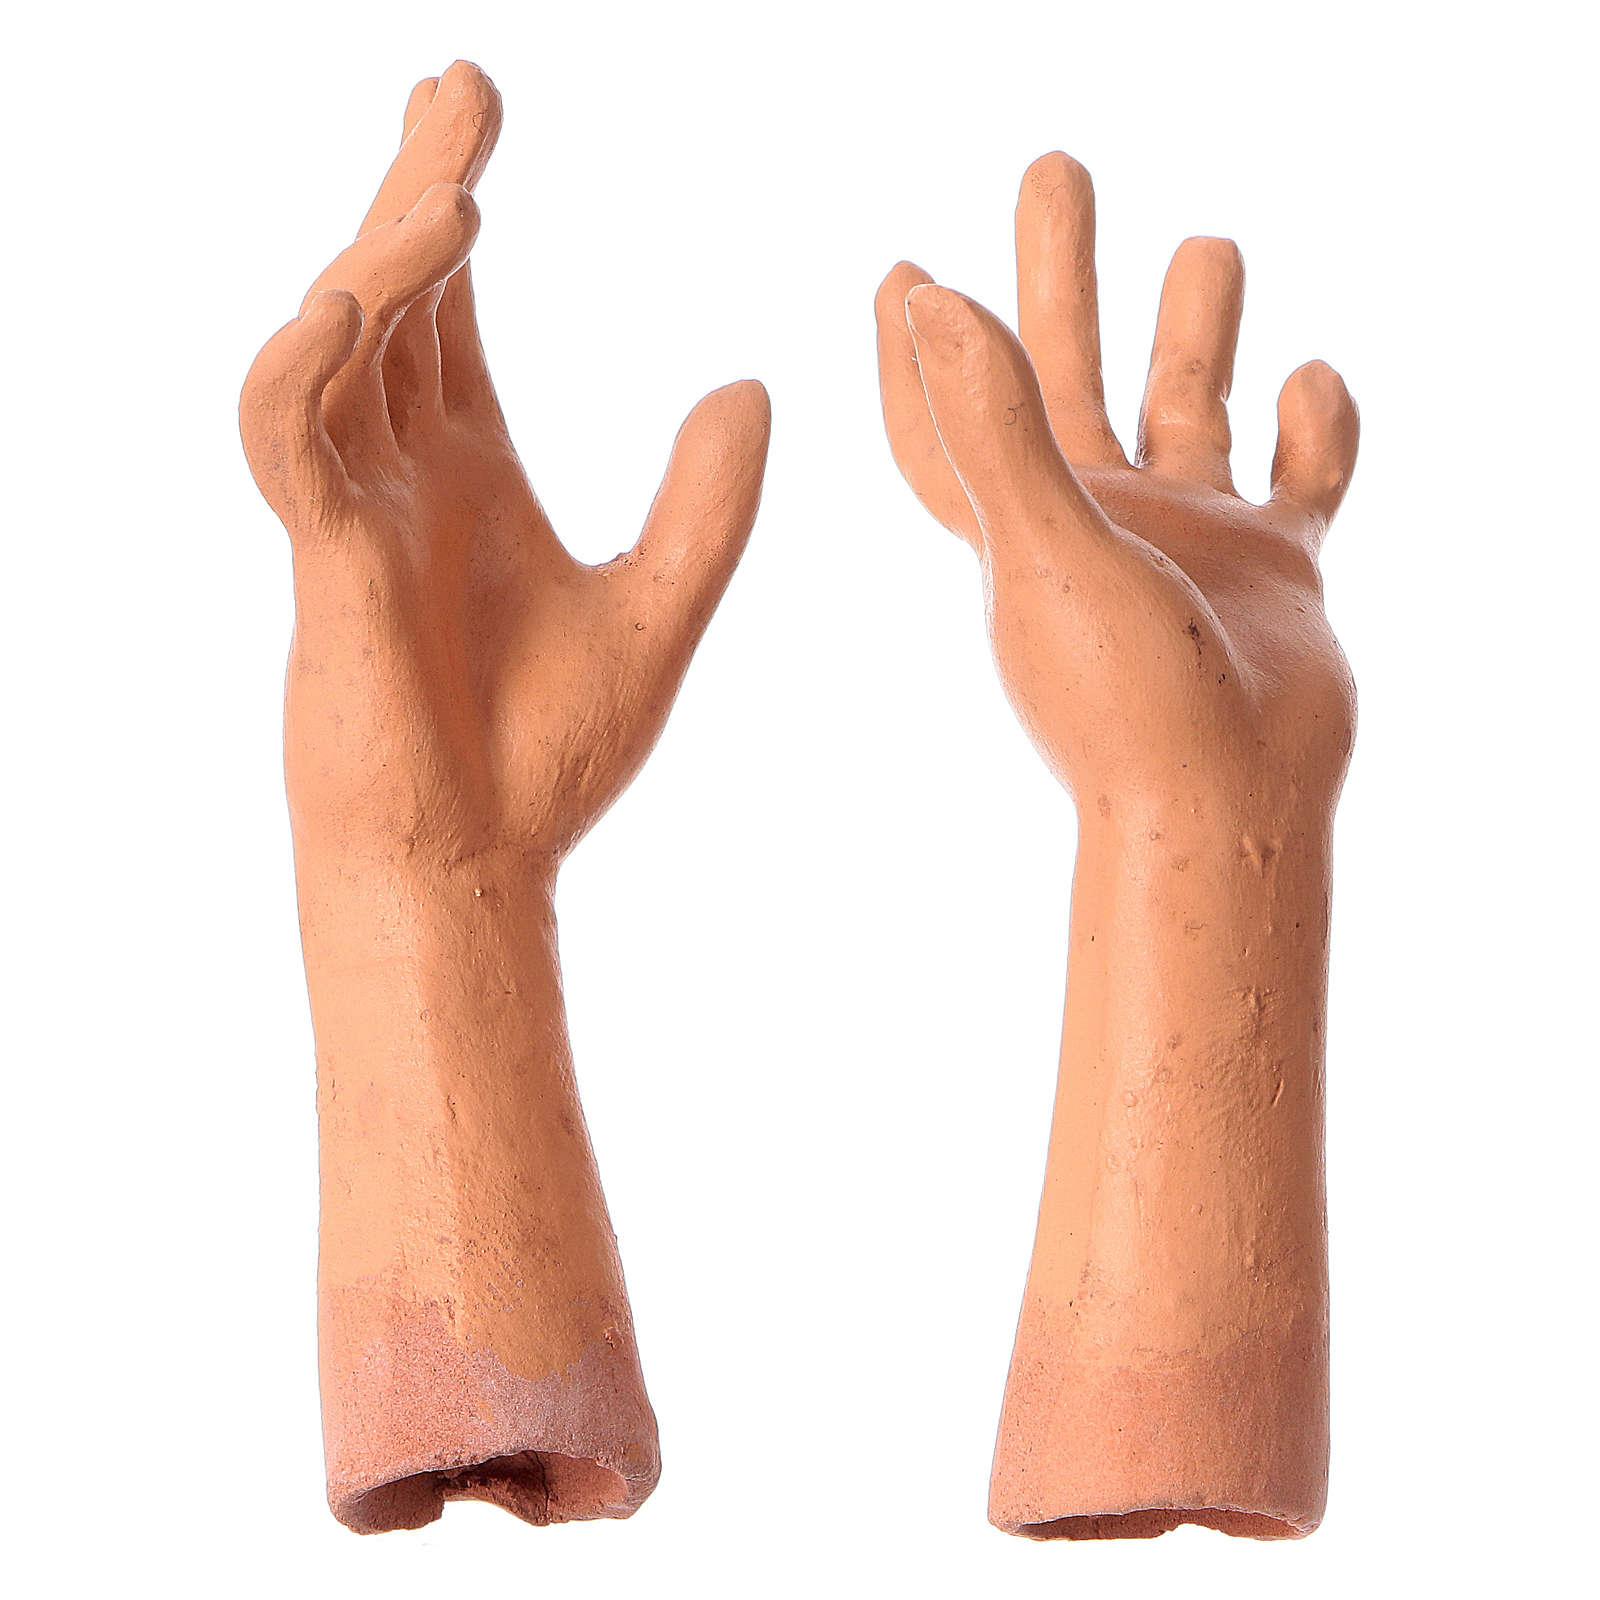 Mani testa piedi terracotta 35 cm Donna capelli bianchi  4